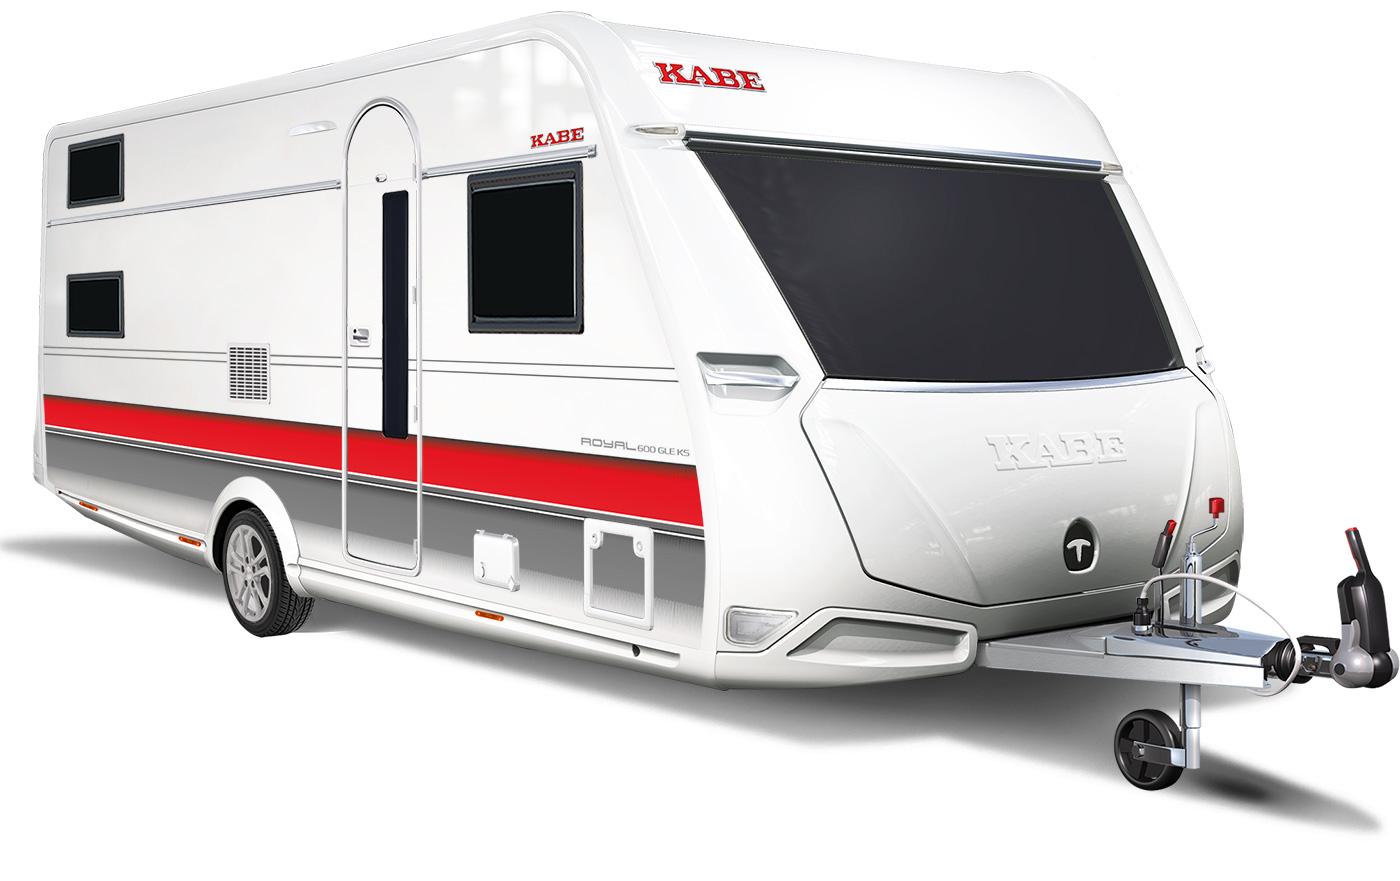 Kabe Royal 600 GLE